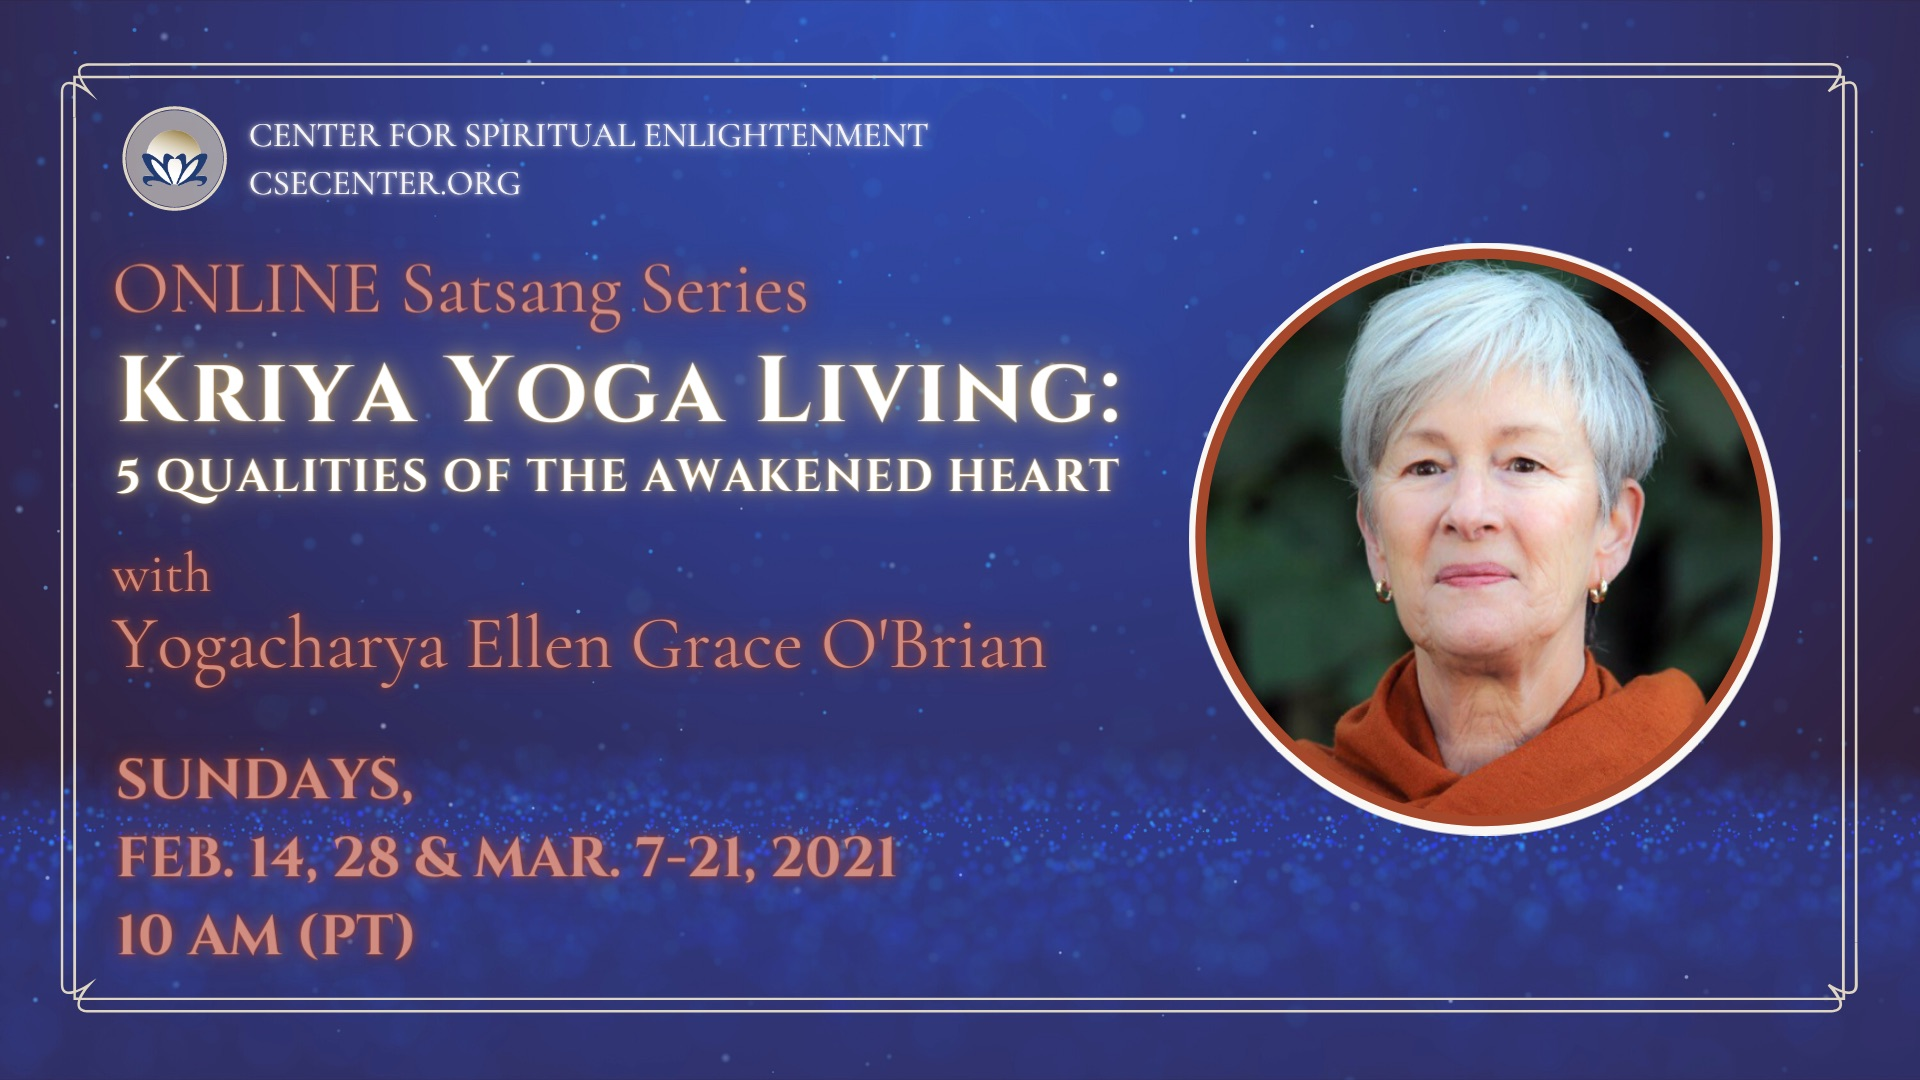 Kriya Yoga Living: Self-Restraint